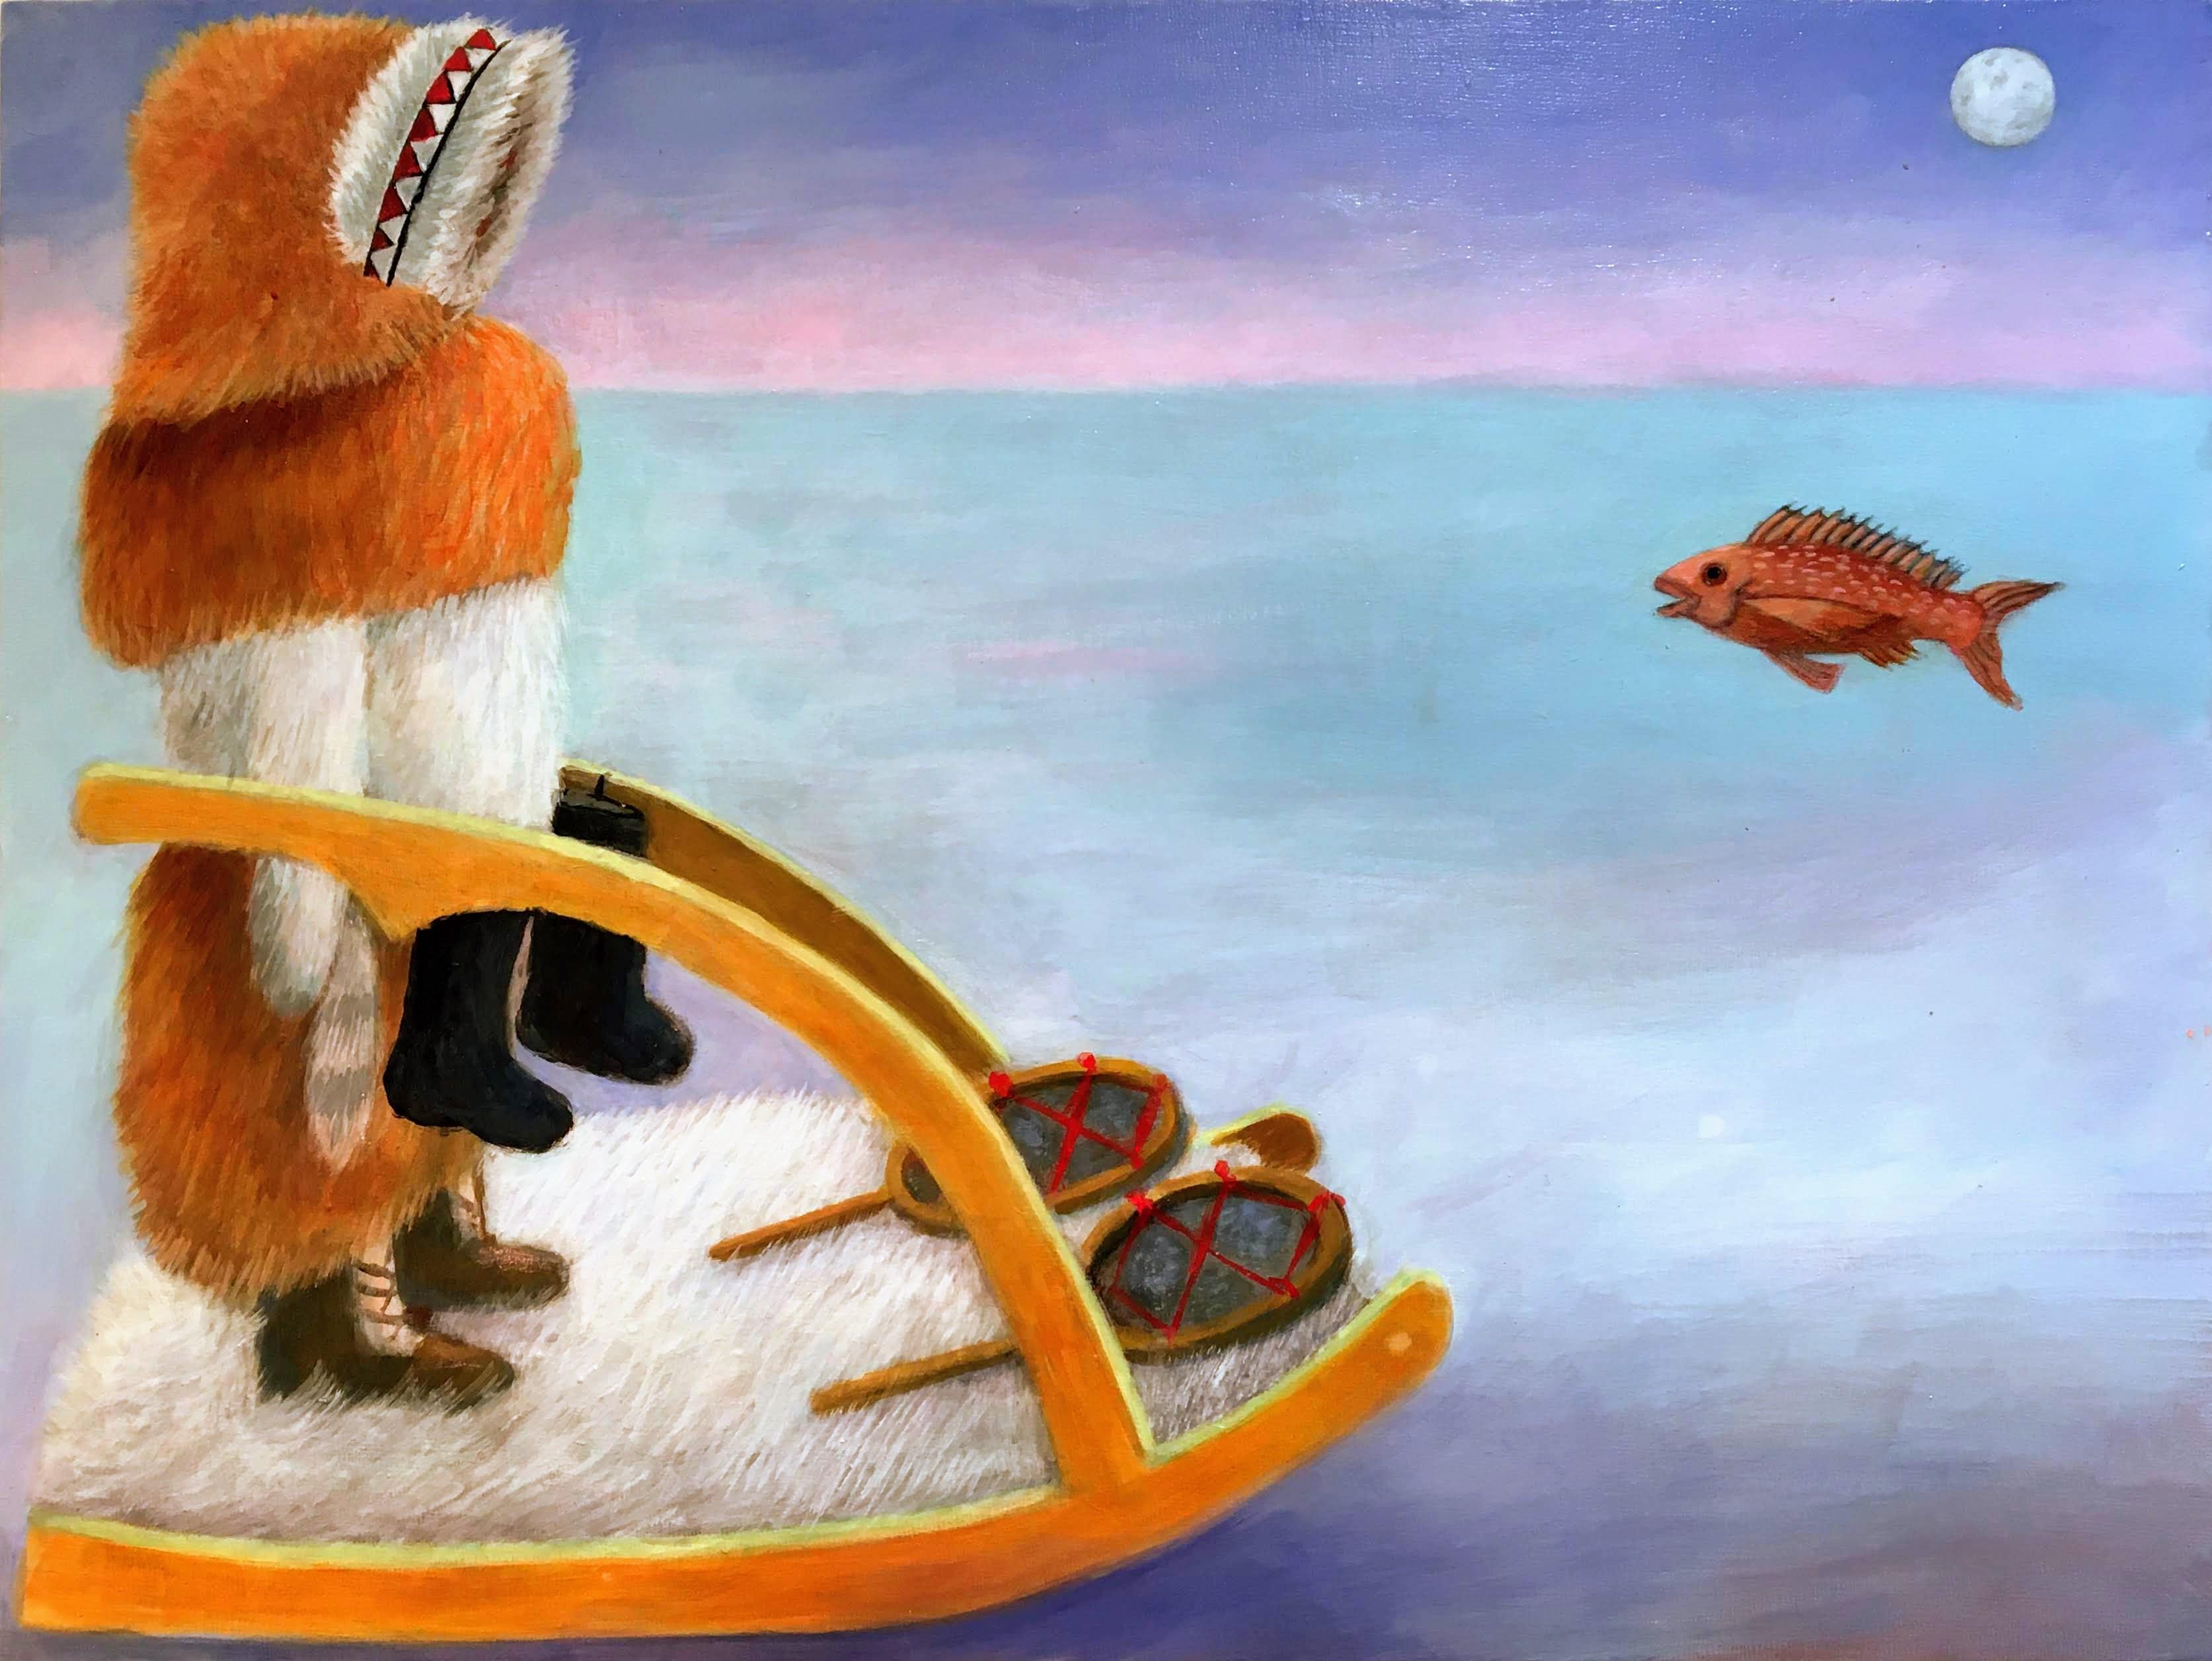 """Minuk in Alaska II"" by Elaine Pawlowicz"